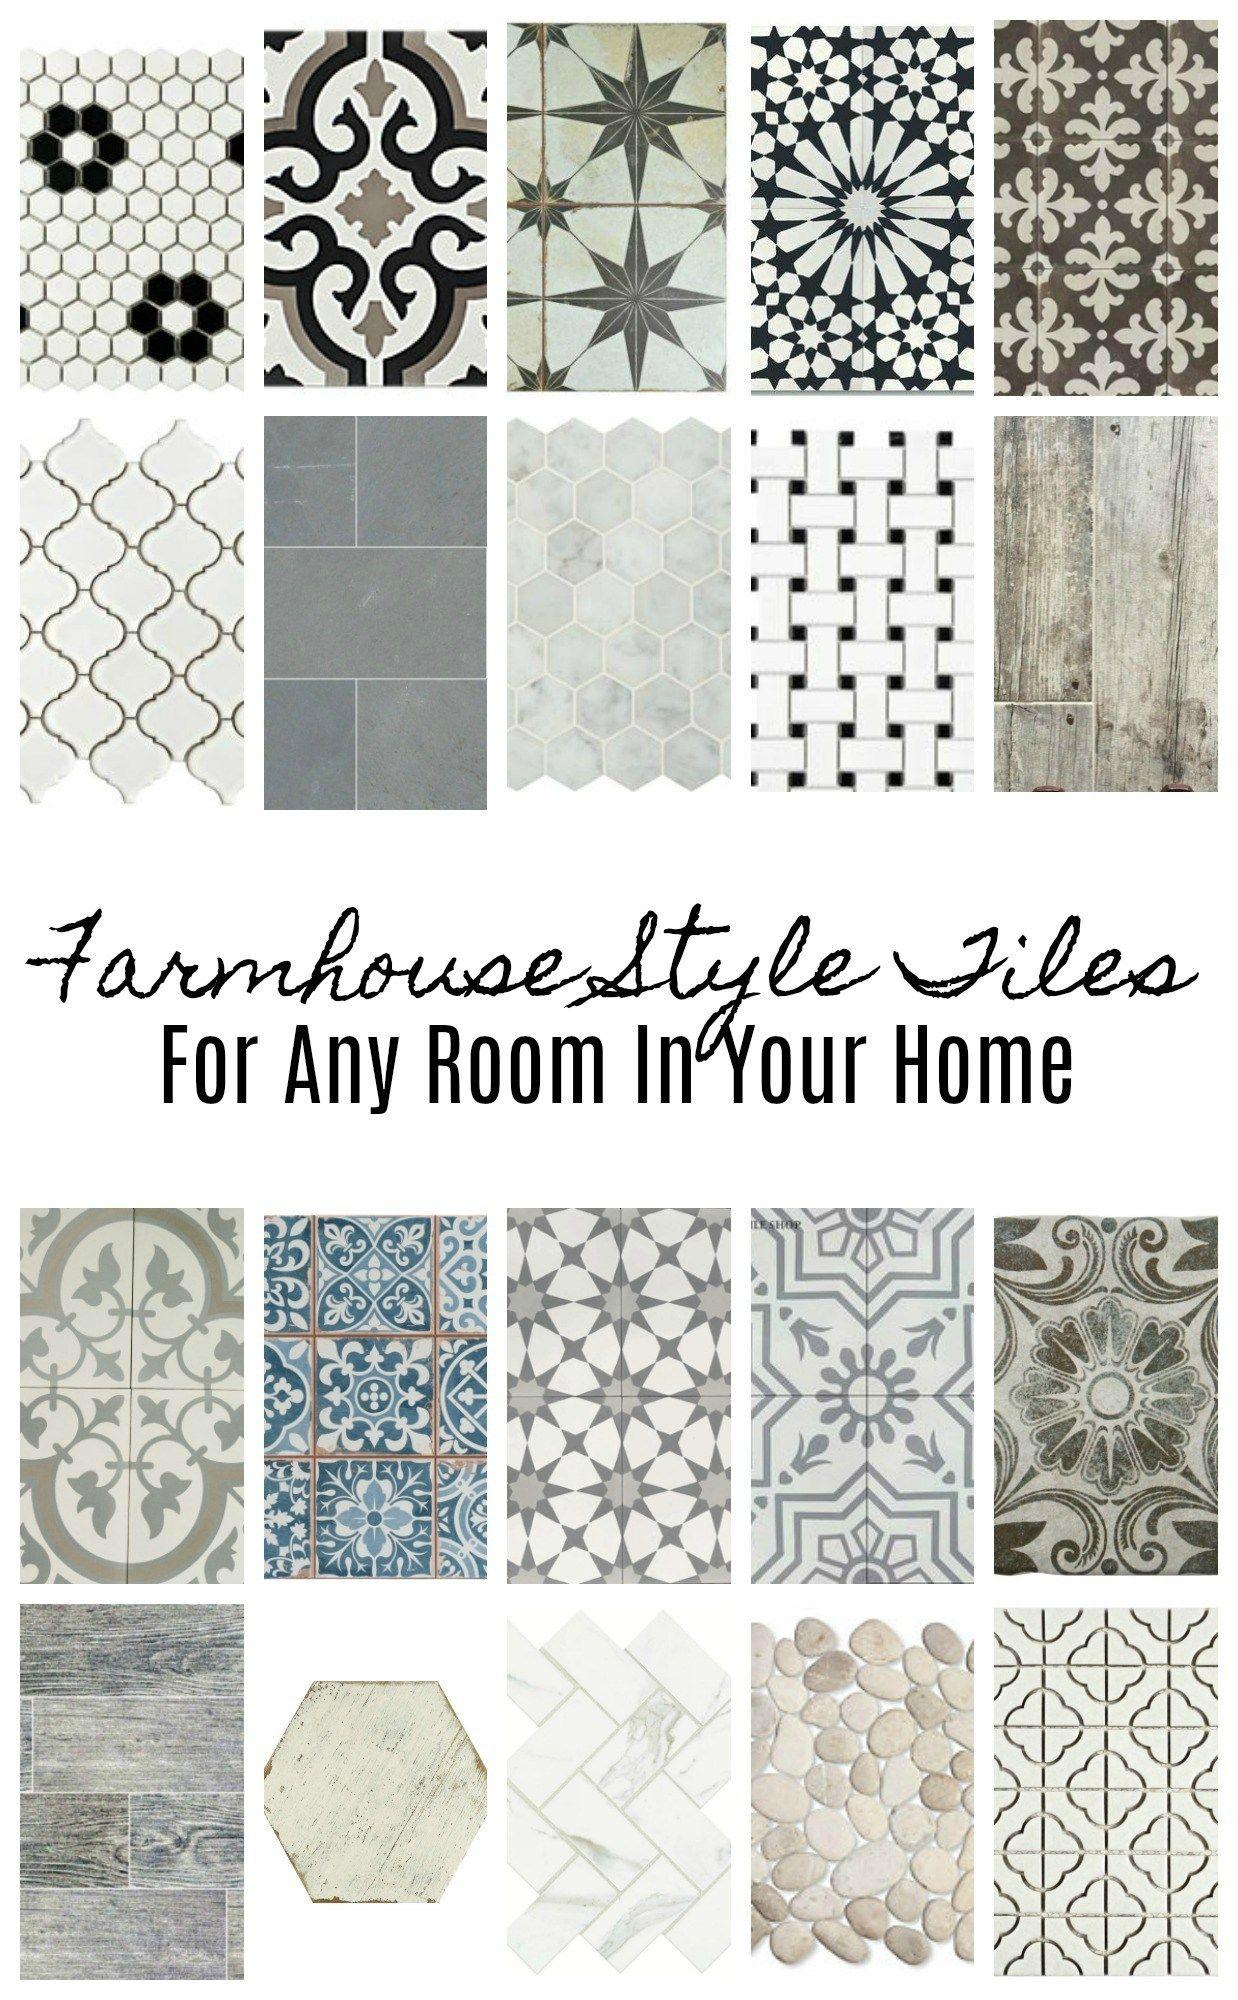 20 beautiful farmhouse style tiles